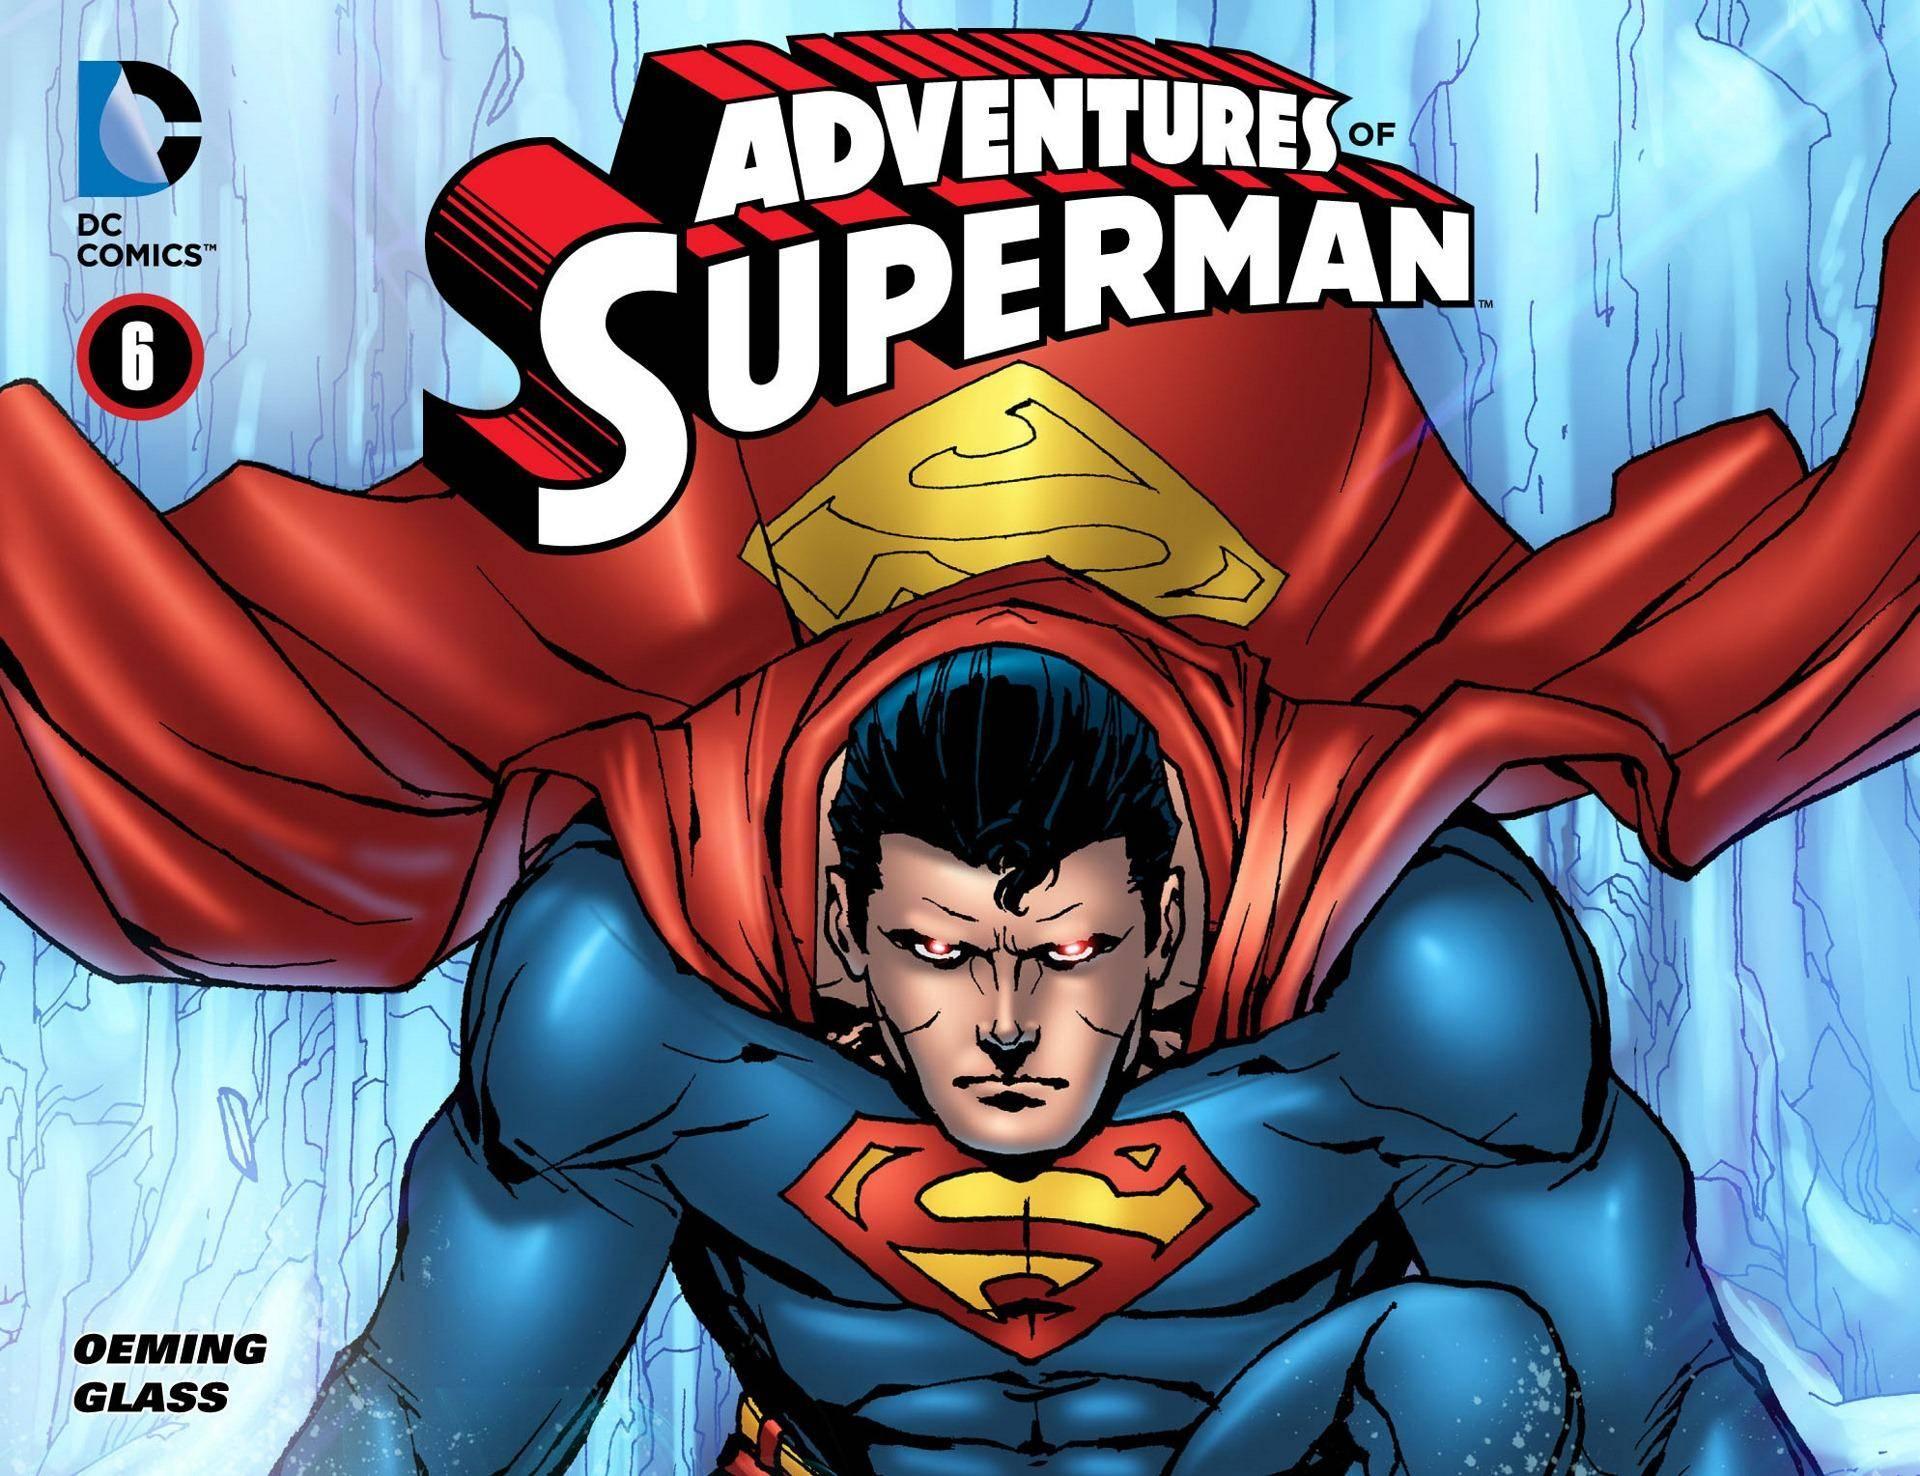 Adventures of Superman 006 2013 Digital